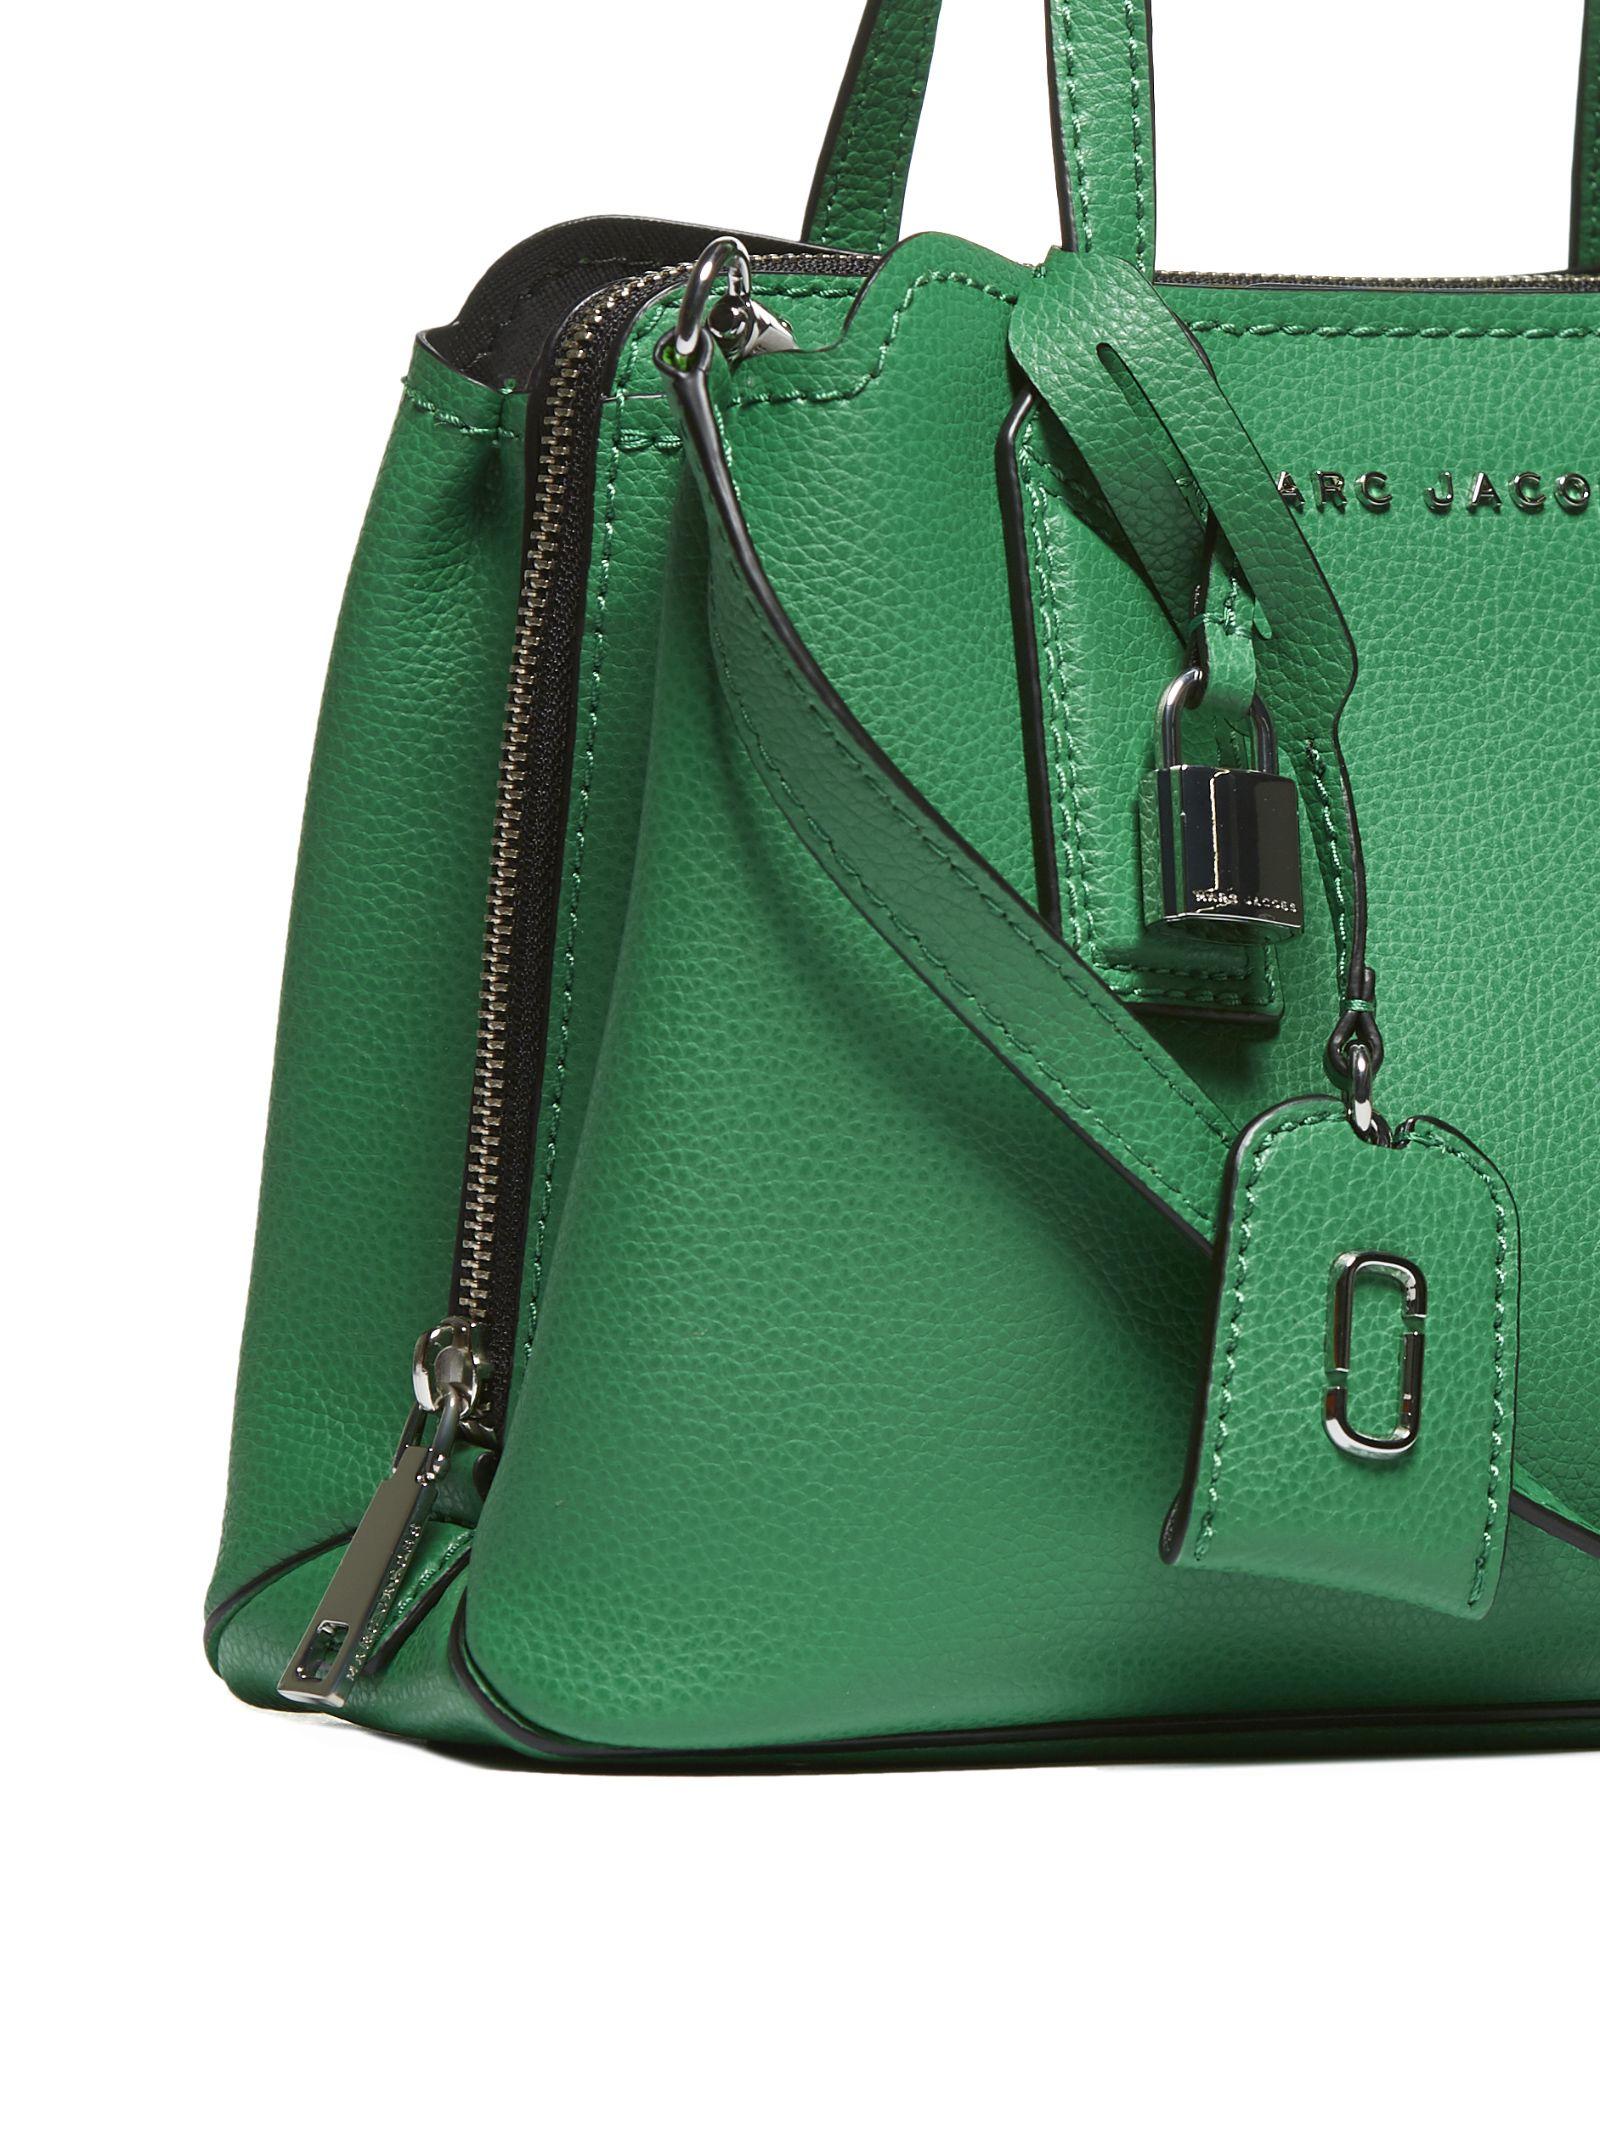 05896bd1b5c Marc Jacobs Marc Jacobs Shoulder Bag - Verde - 10797395 | italist